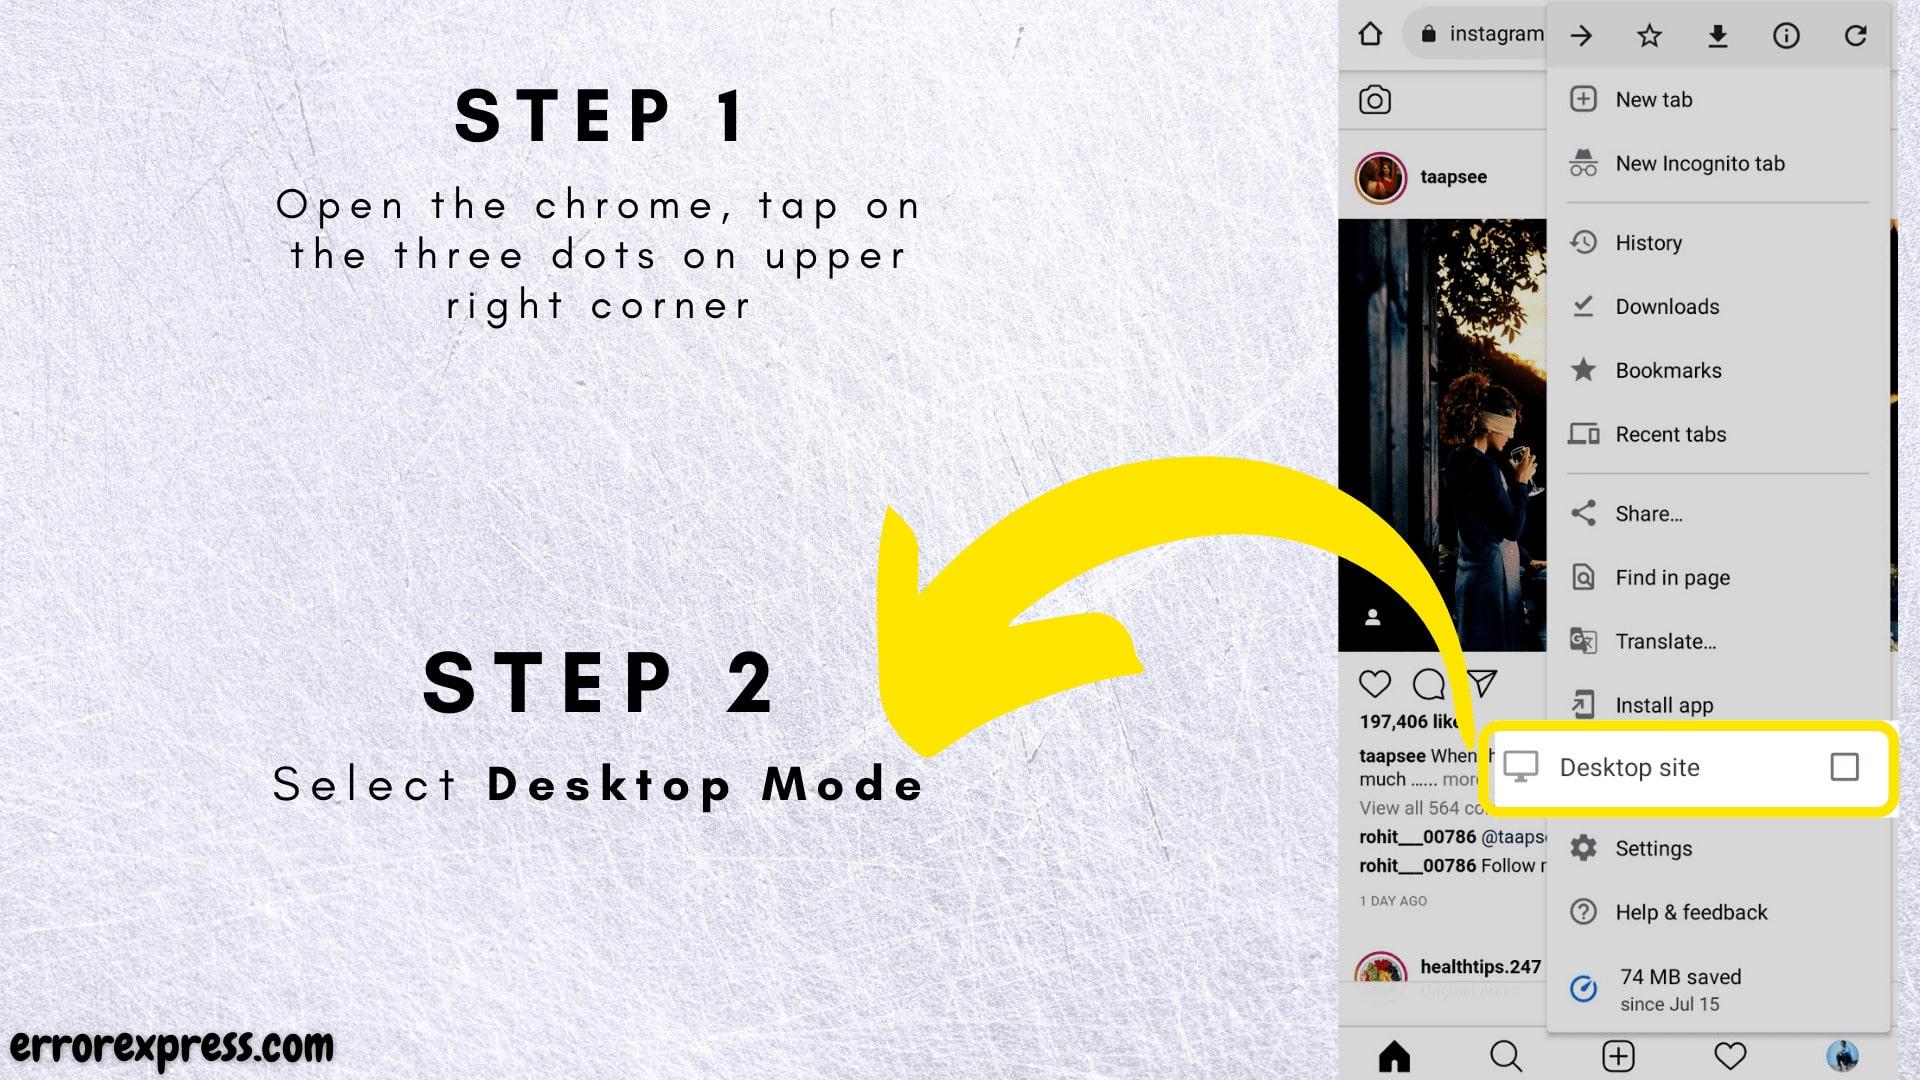 Go to instagram.com on chrome and turn on desktop mode